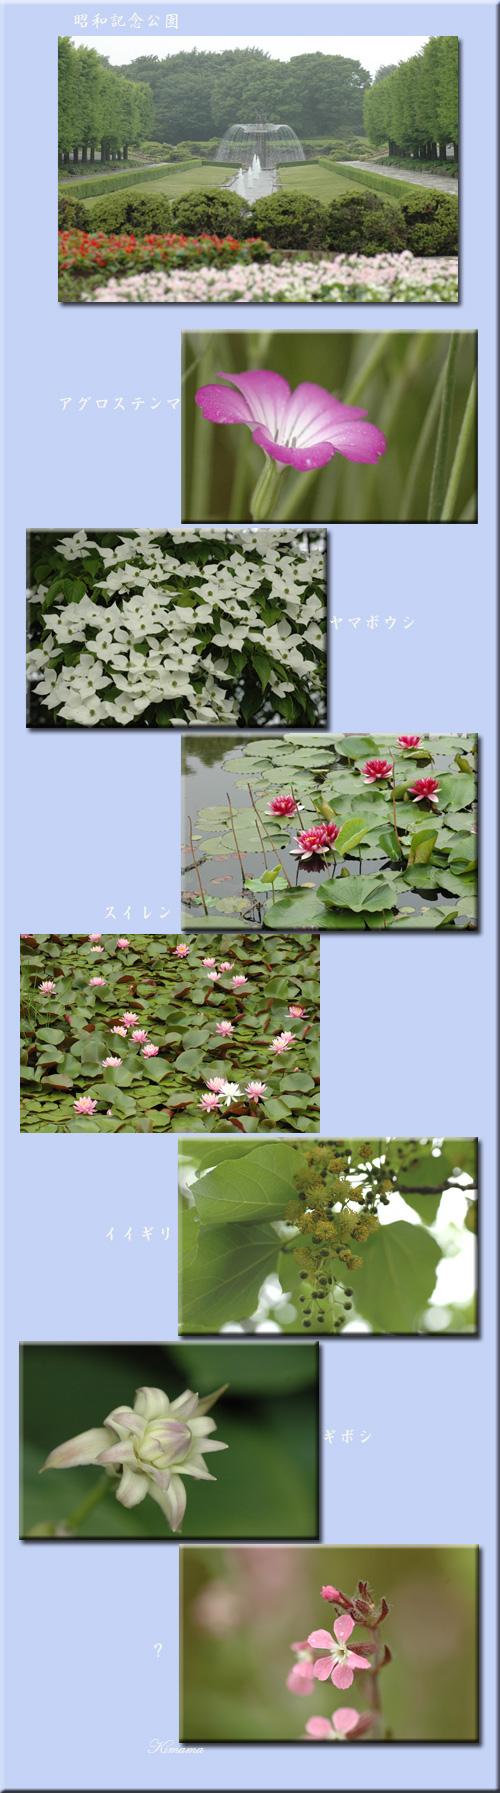 昭和記念公園の花_c0051105_11435513.jpg